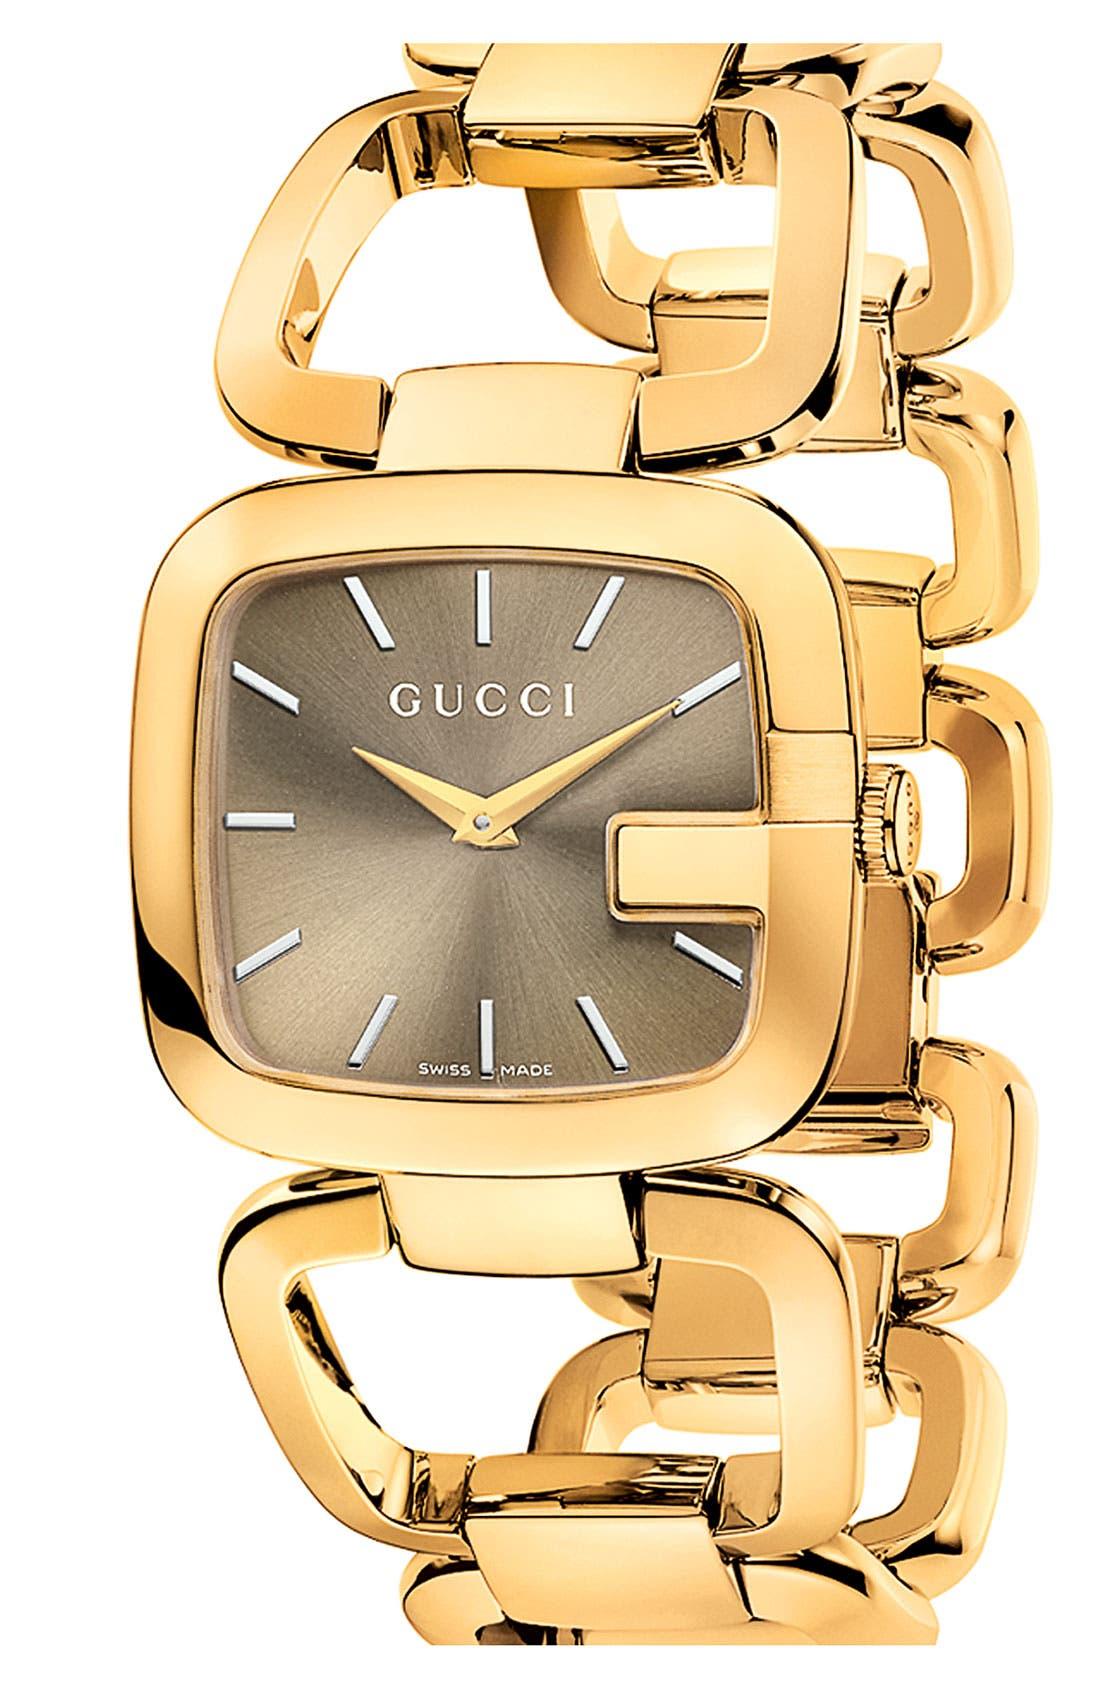 Main Image - Gucci 'G-Gucci' Bracelet Watch, 32mm